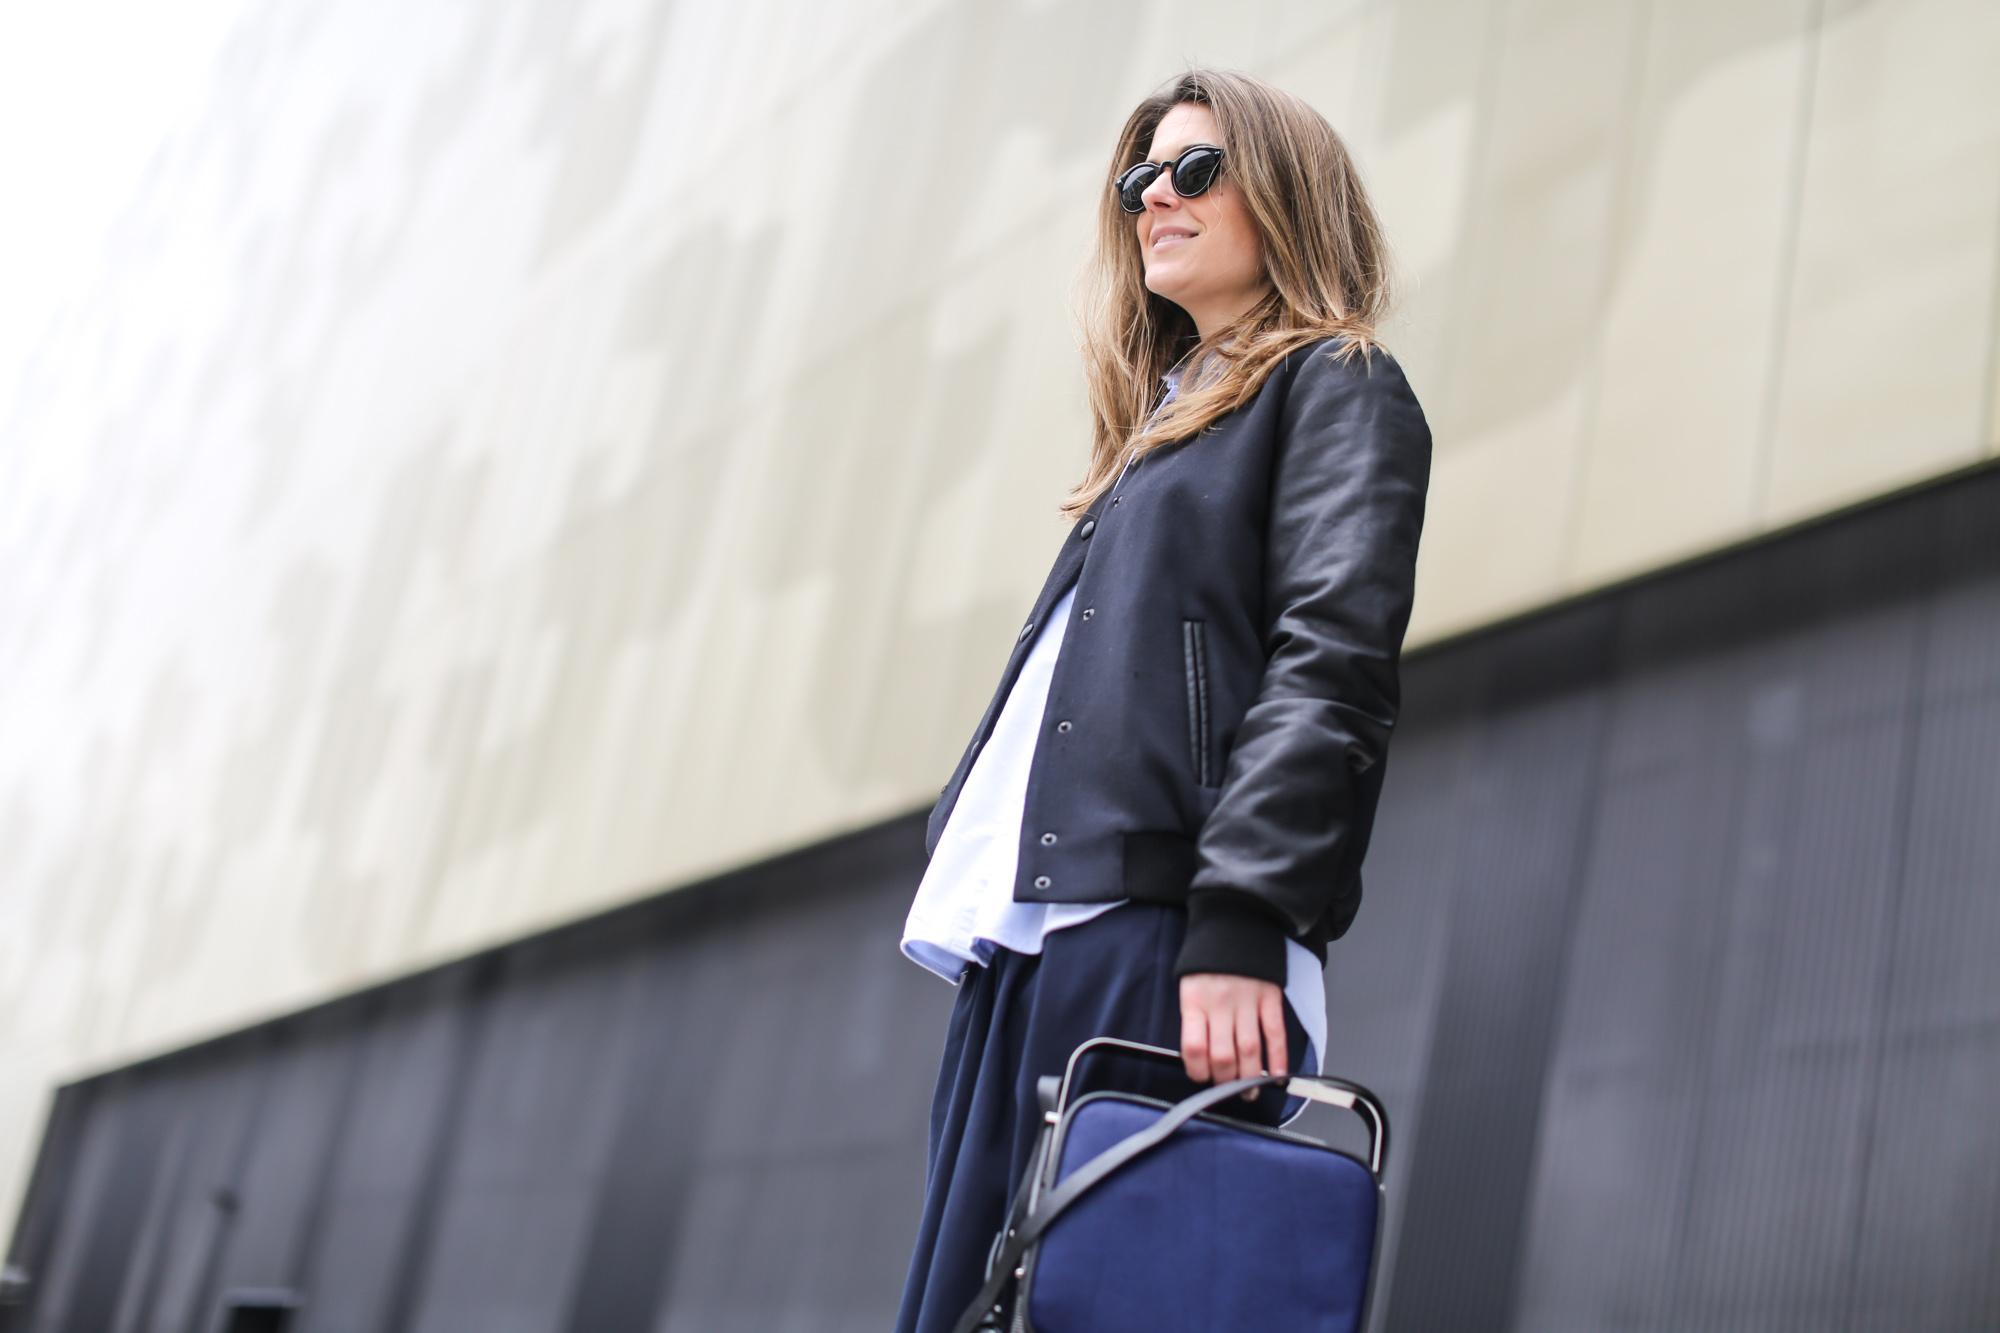 Clochet-streetstyle-finery-london-bag-culottes-bomber-jacket-7